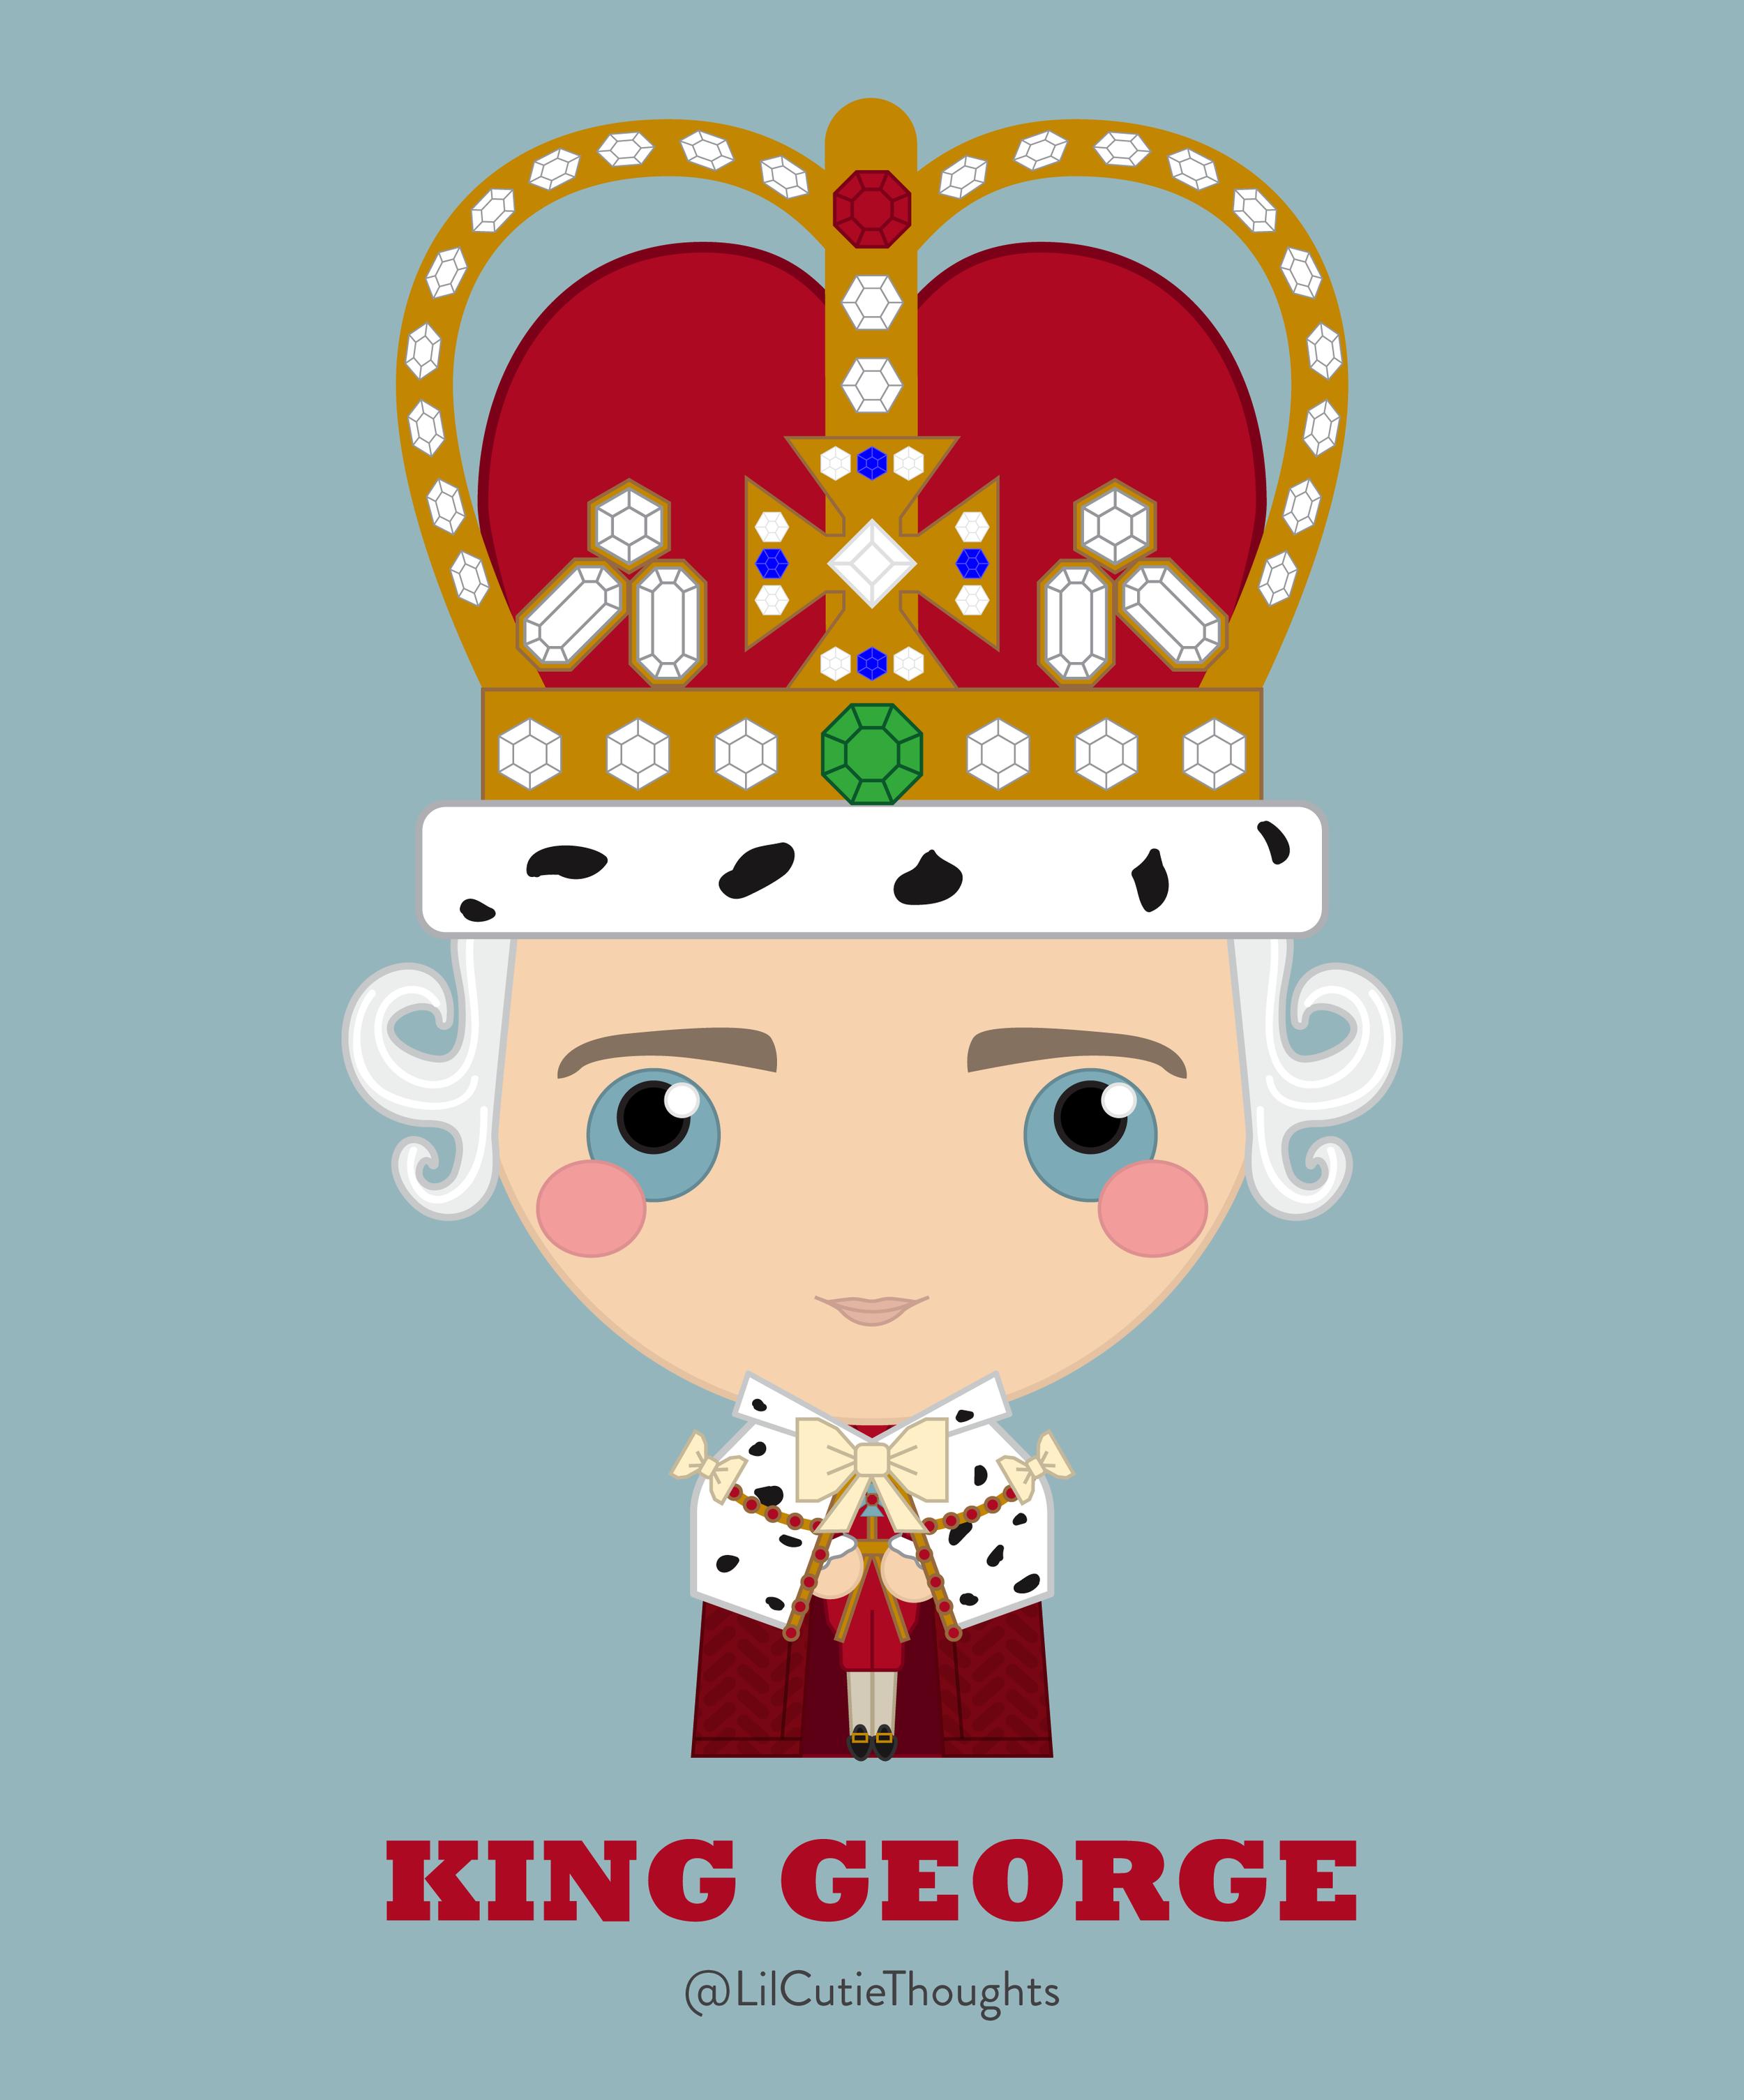 LilCutie_Hamilton_KingGeorge.png